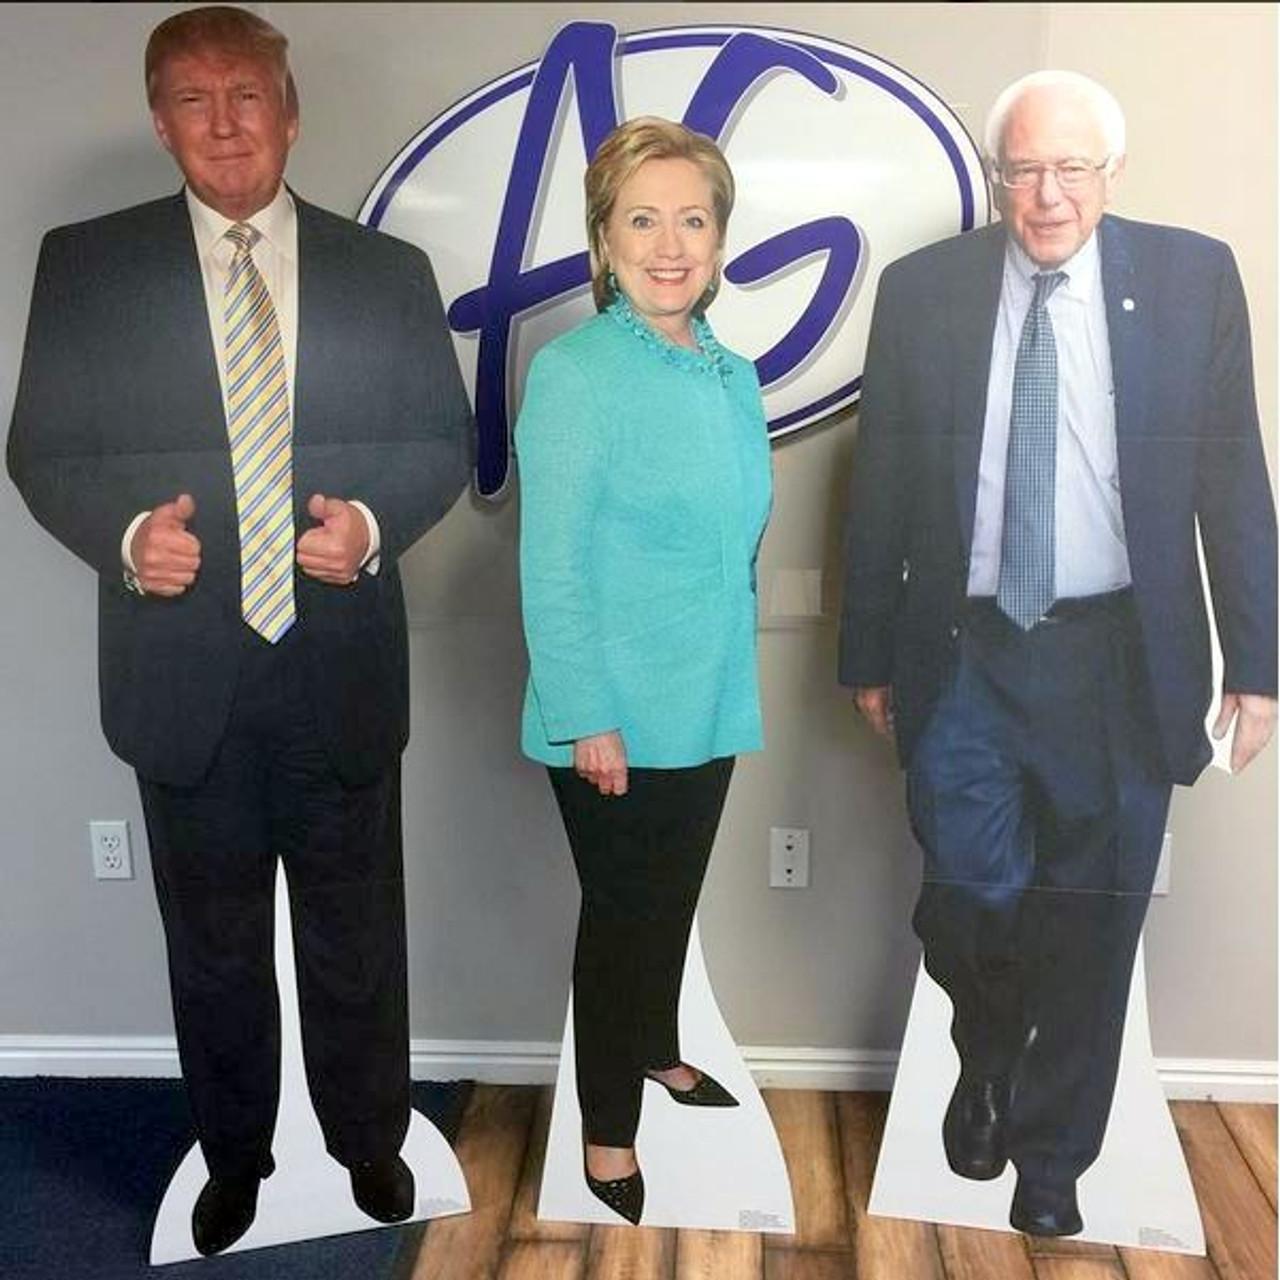 Life-size Hillary Clinton Cardboard Standup